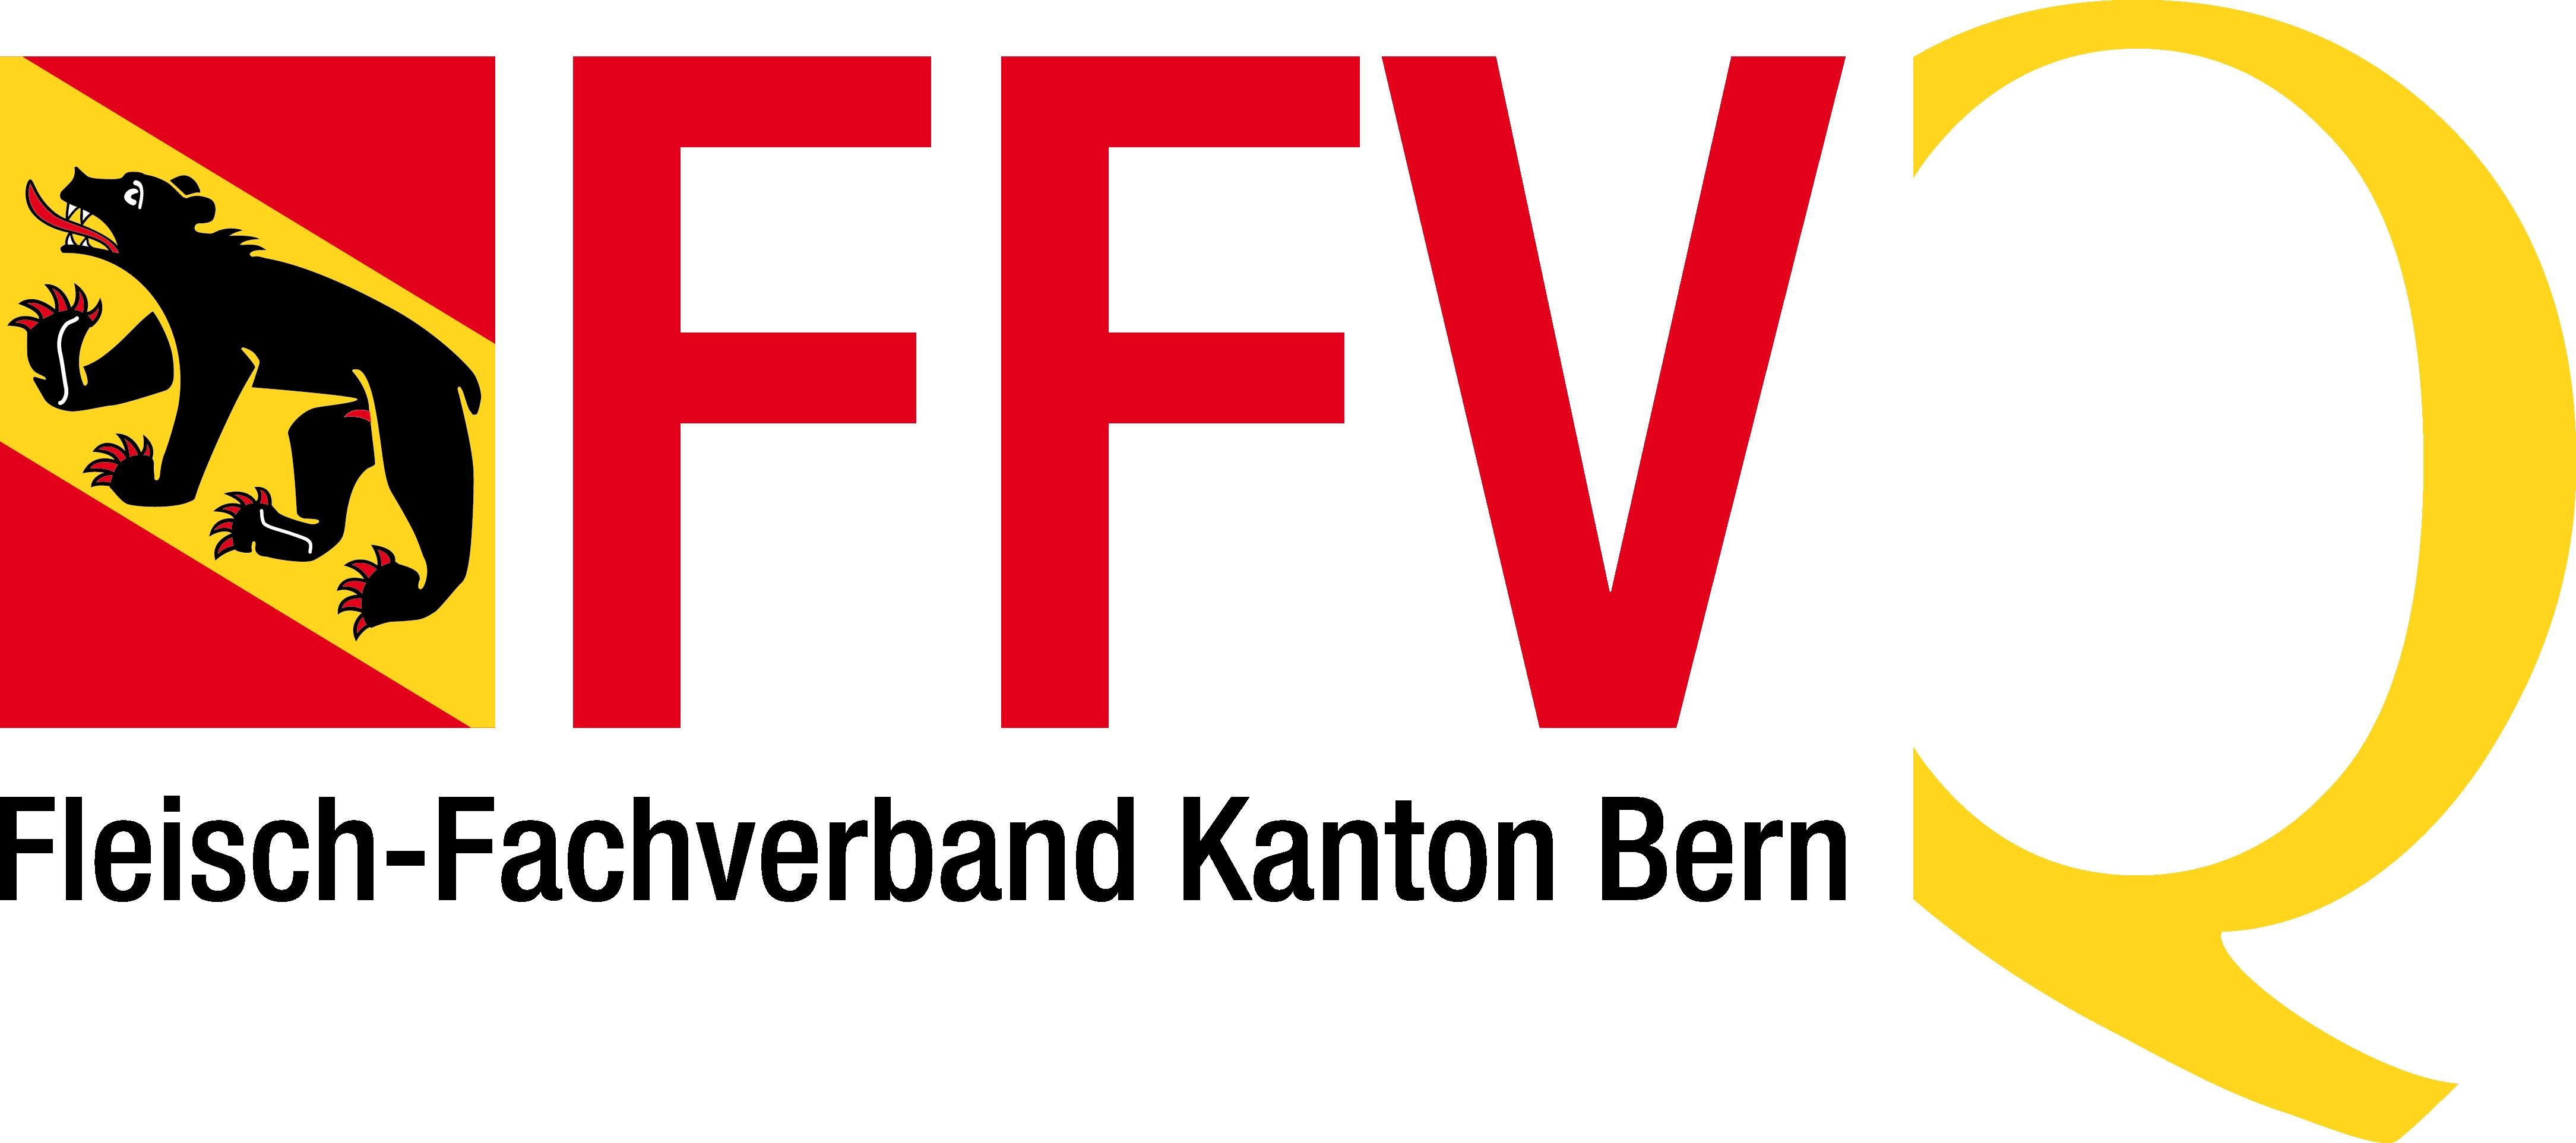 Fleisch-Fachverband Bern